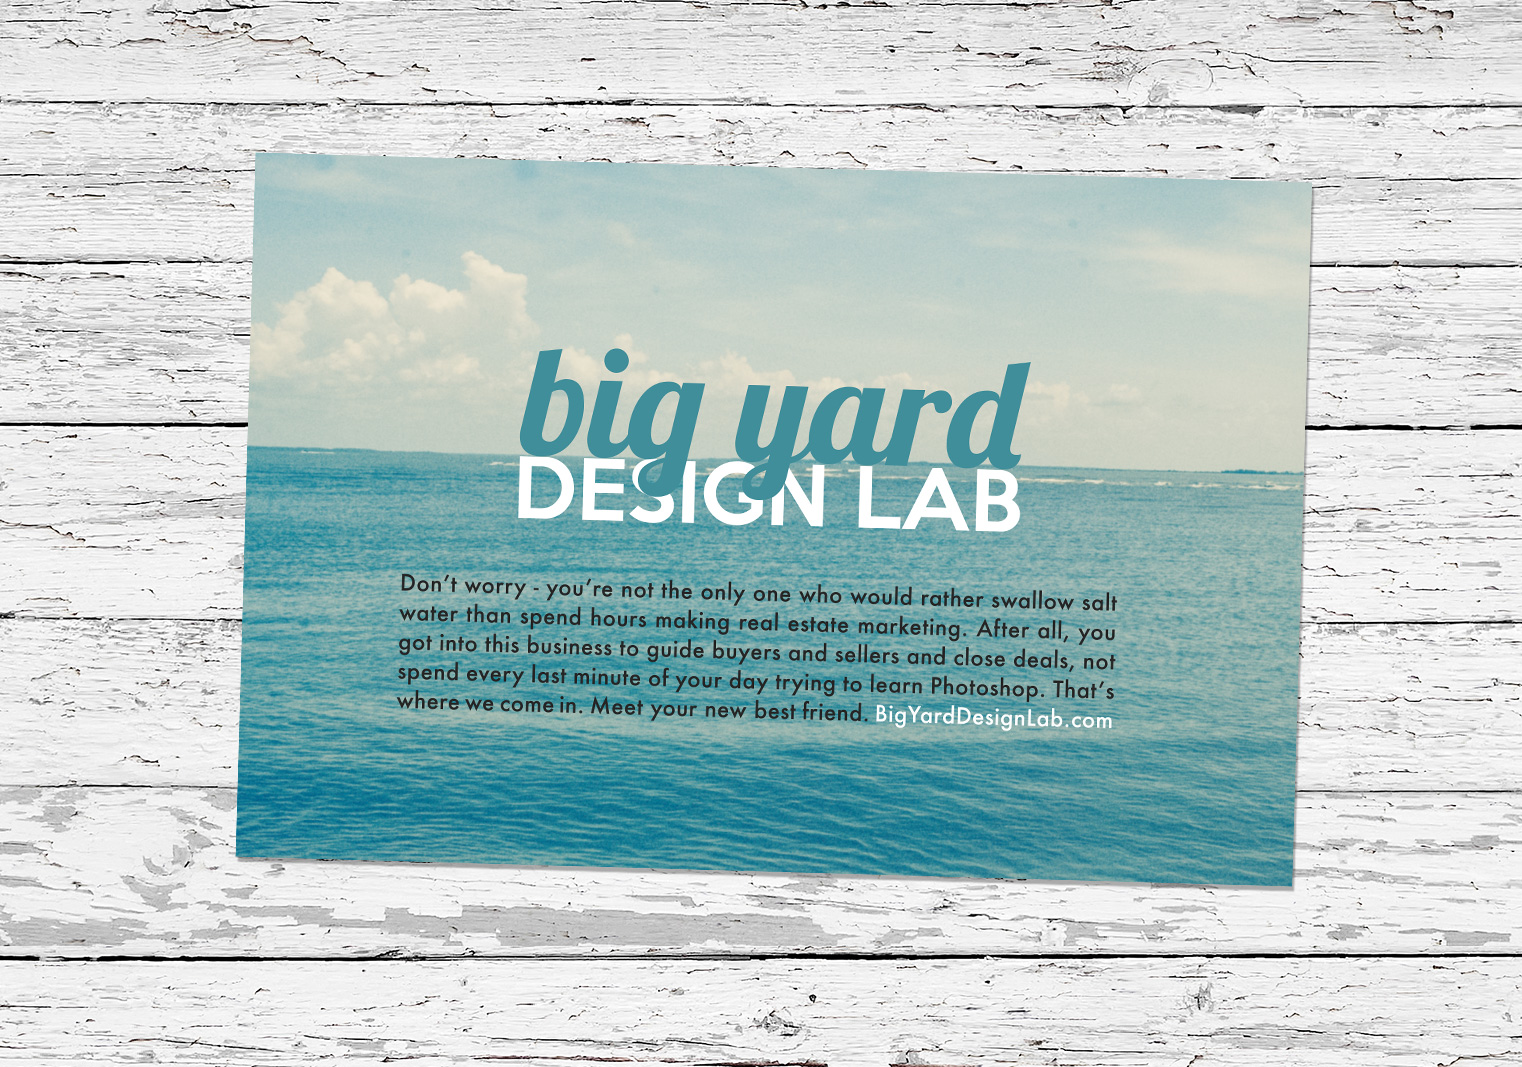 Big Yard Design Lab